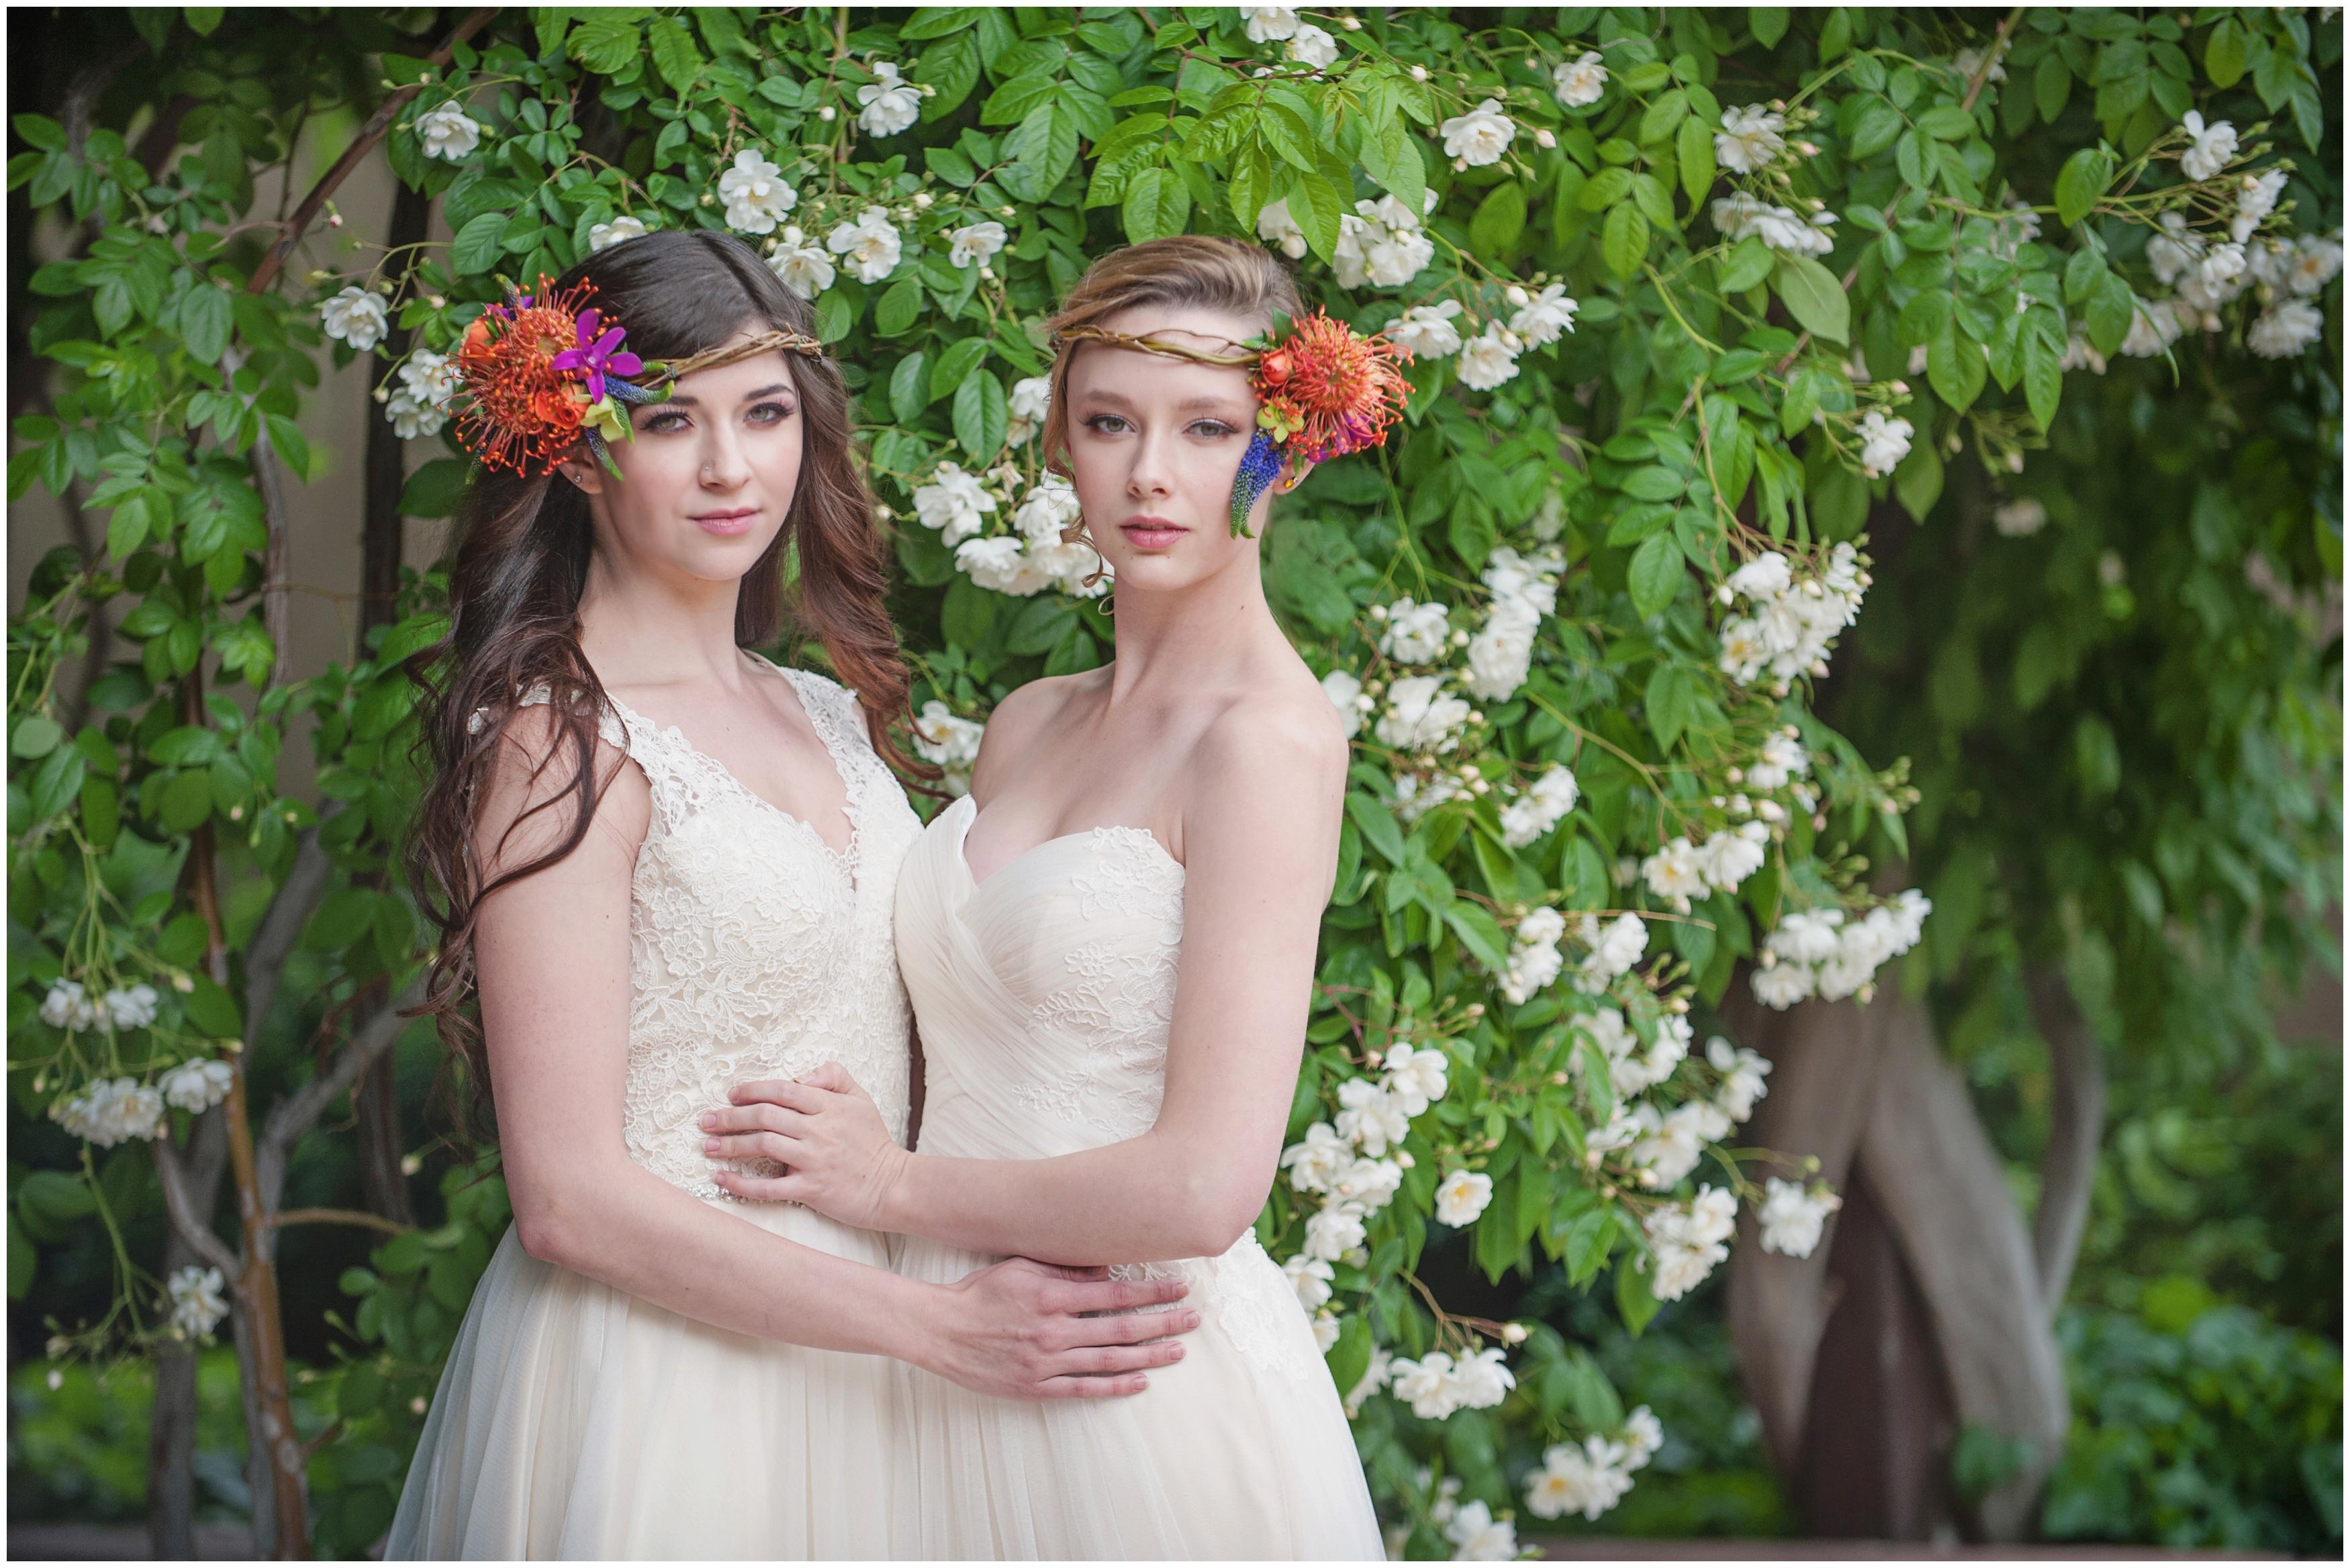 ballerina_brides_botanical_gardens_0012.jpg